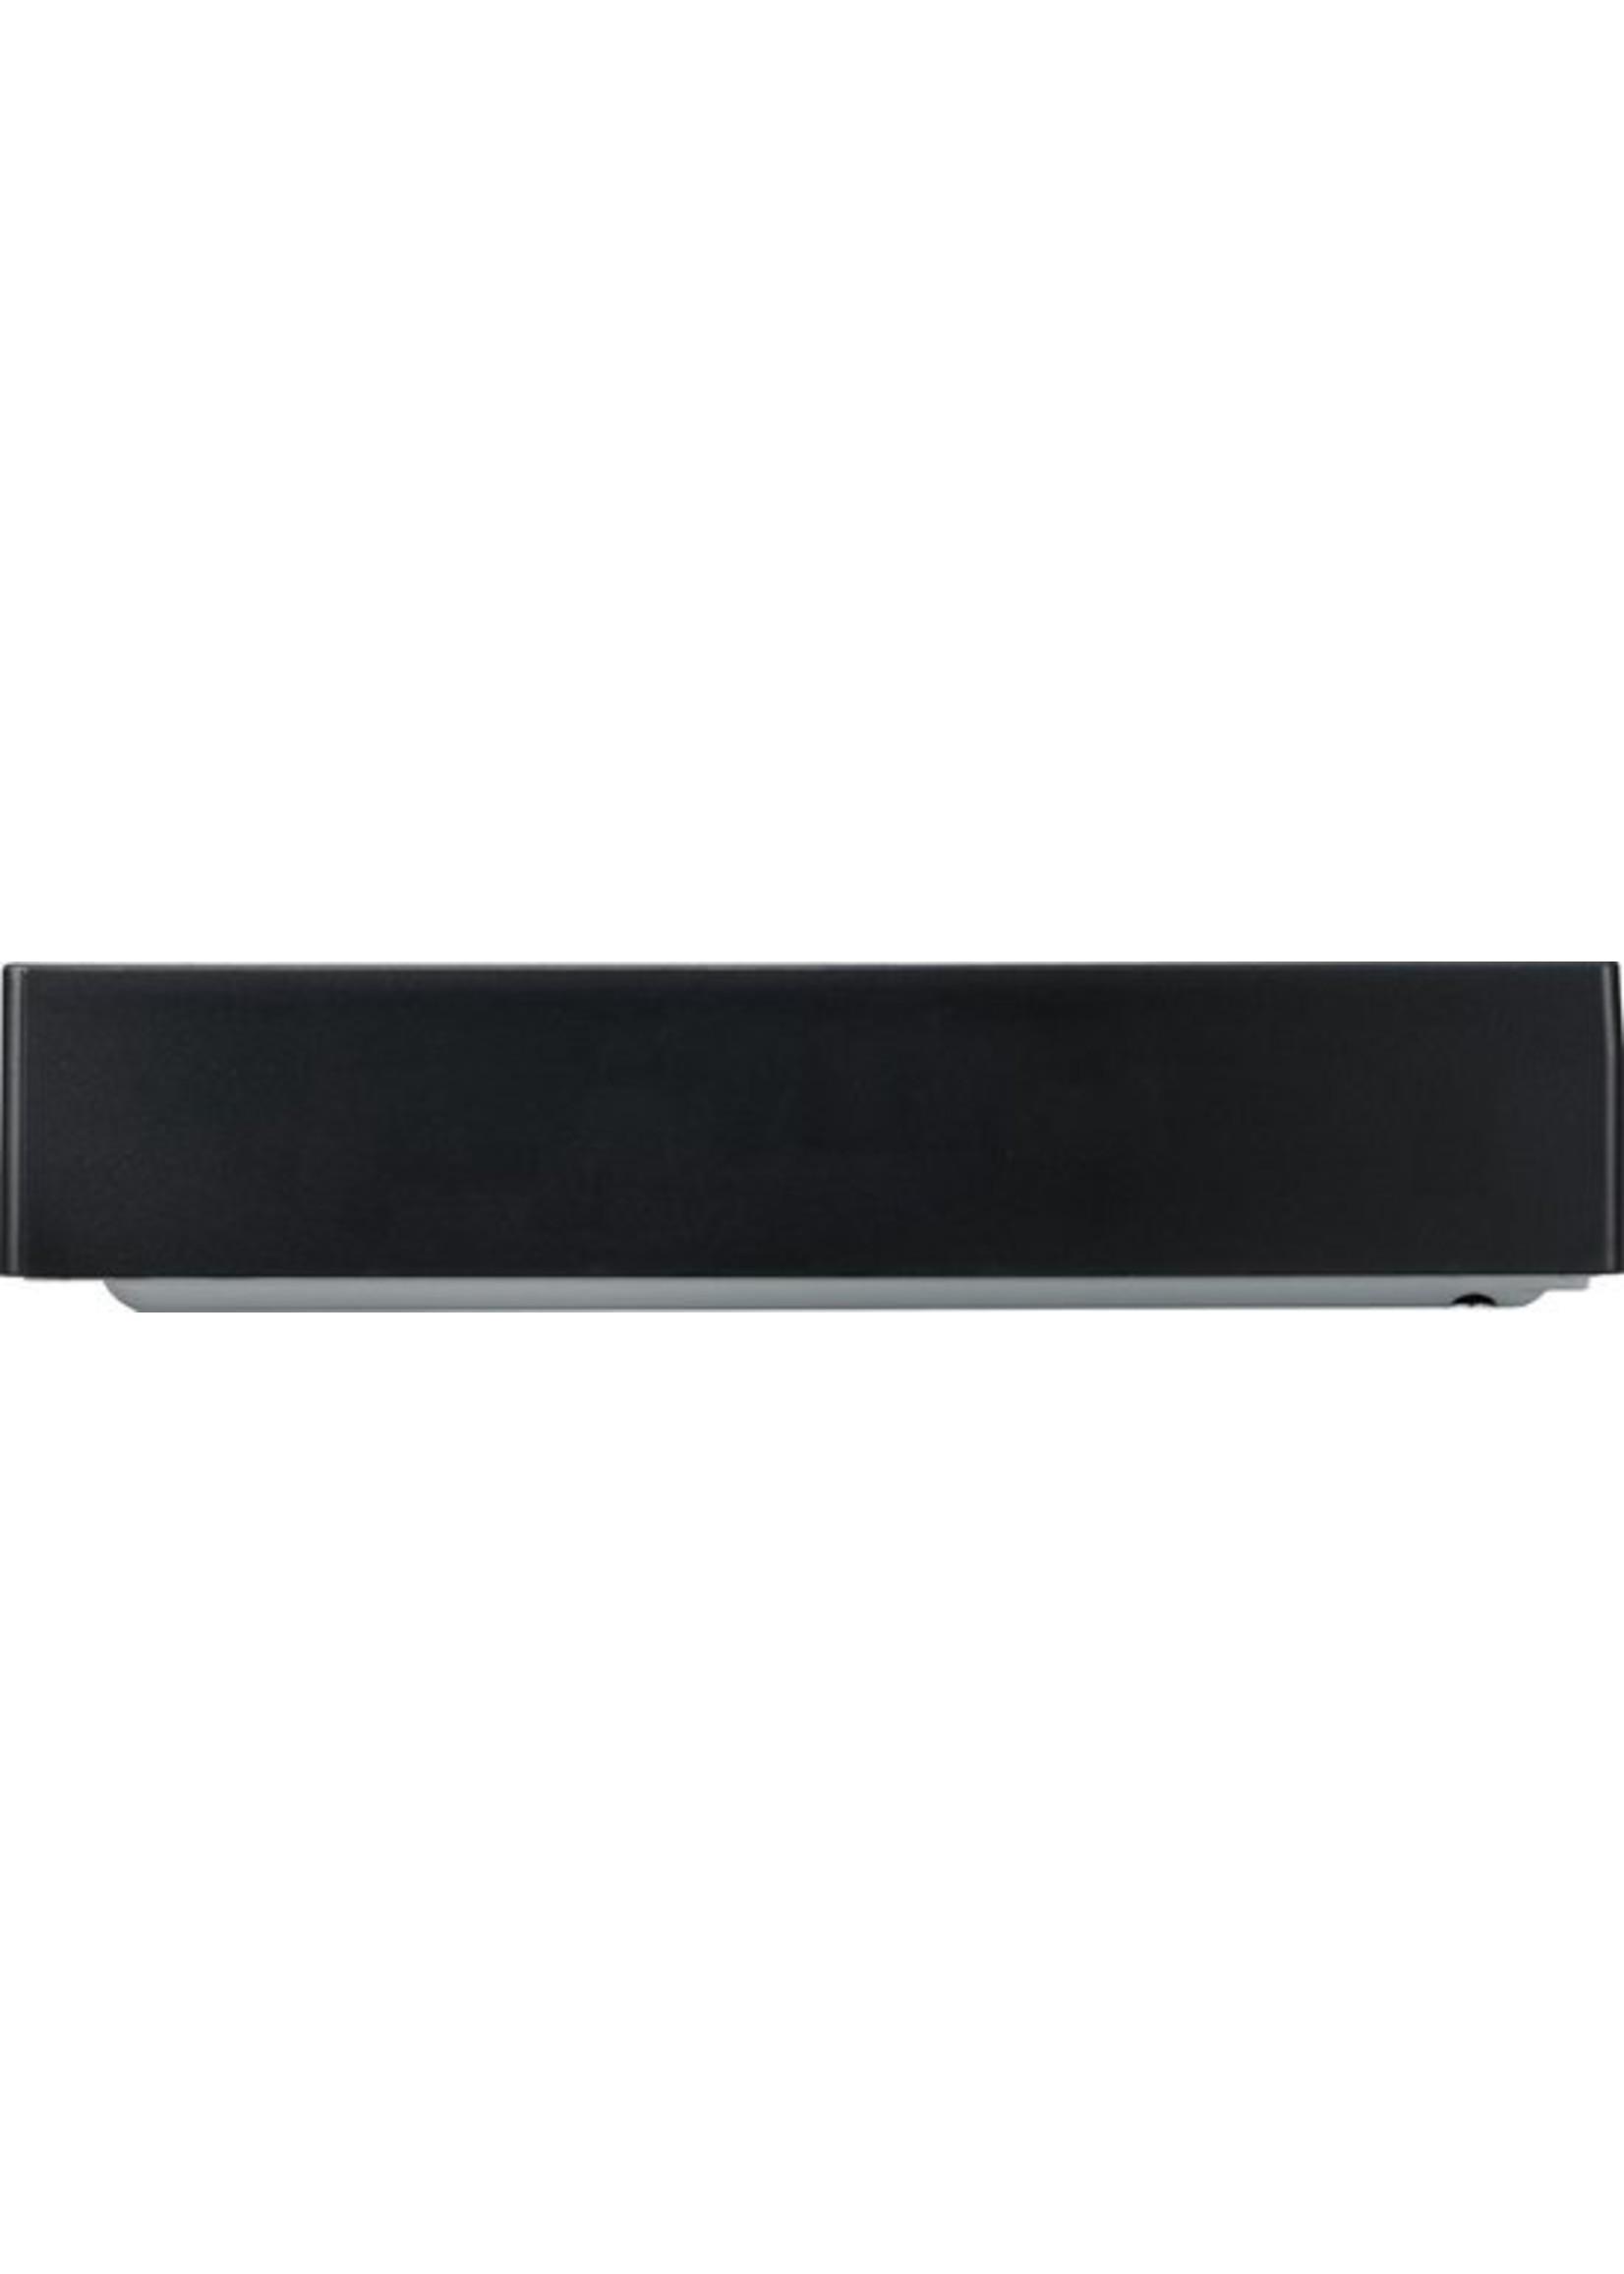 LG LG UBK90 - Blu-Ray-speler koopjeshoek